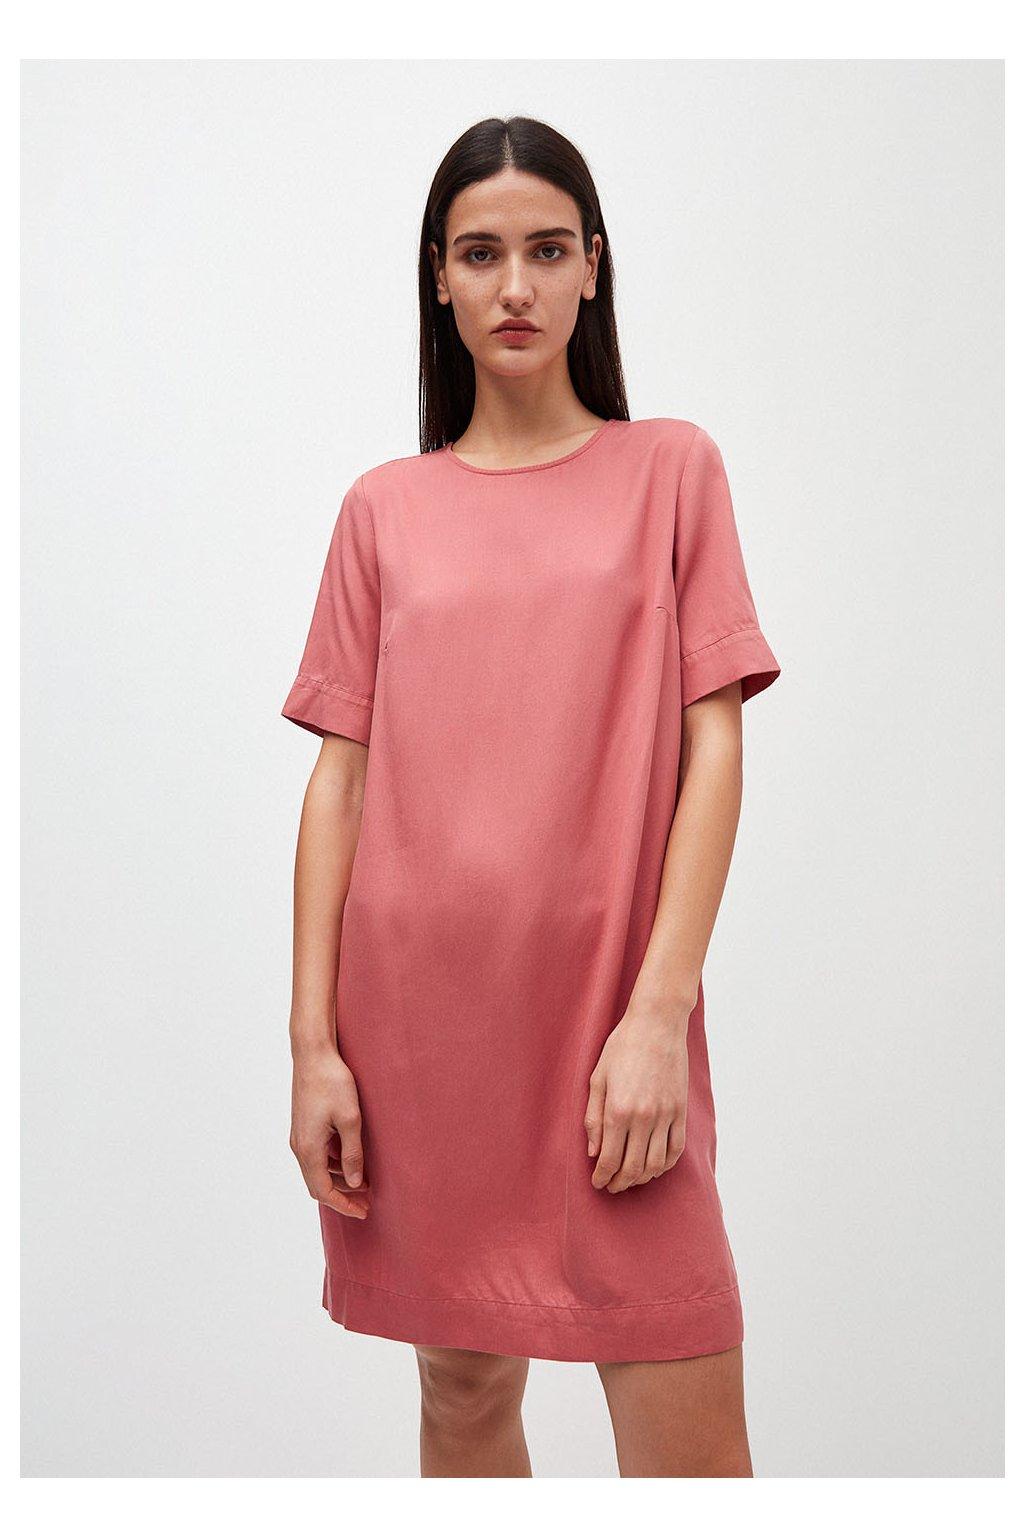 "Dámské růžové šaty ""MARGITAA cinnamon rose"" (Velikost L)"